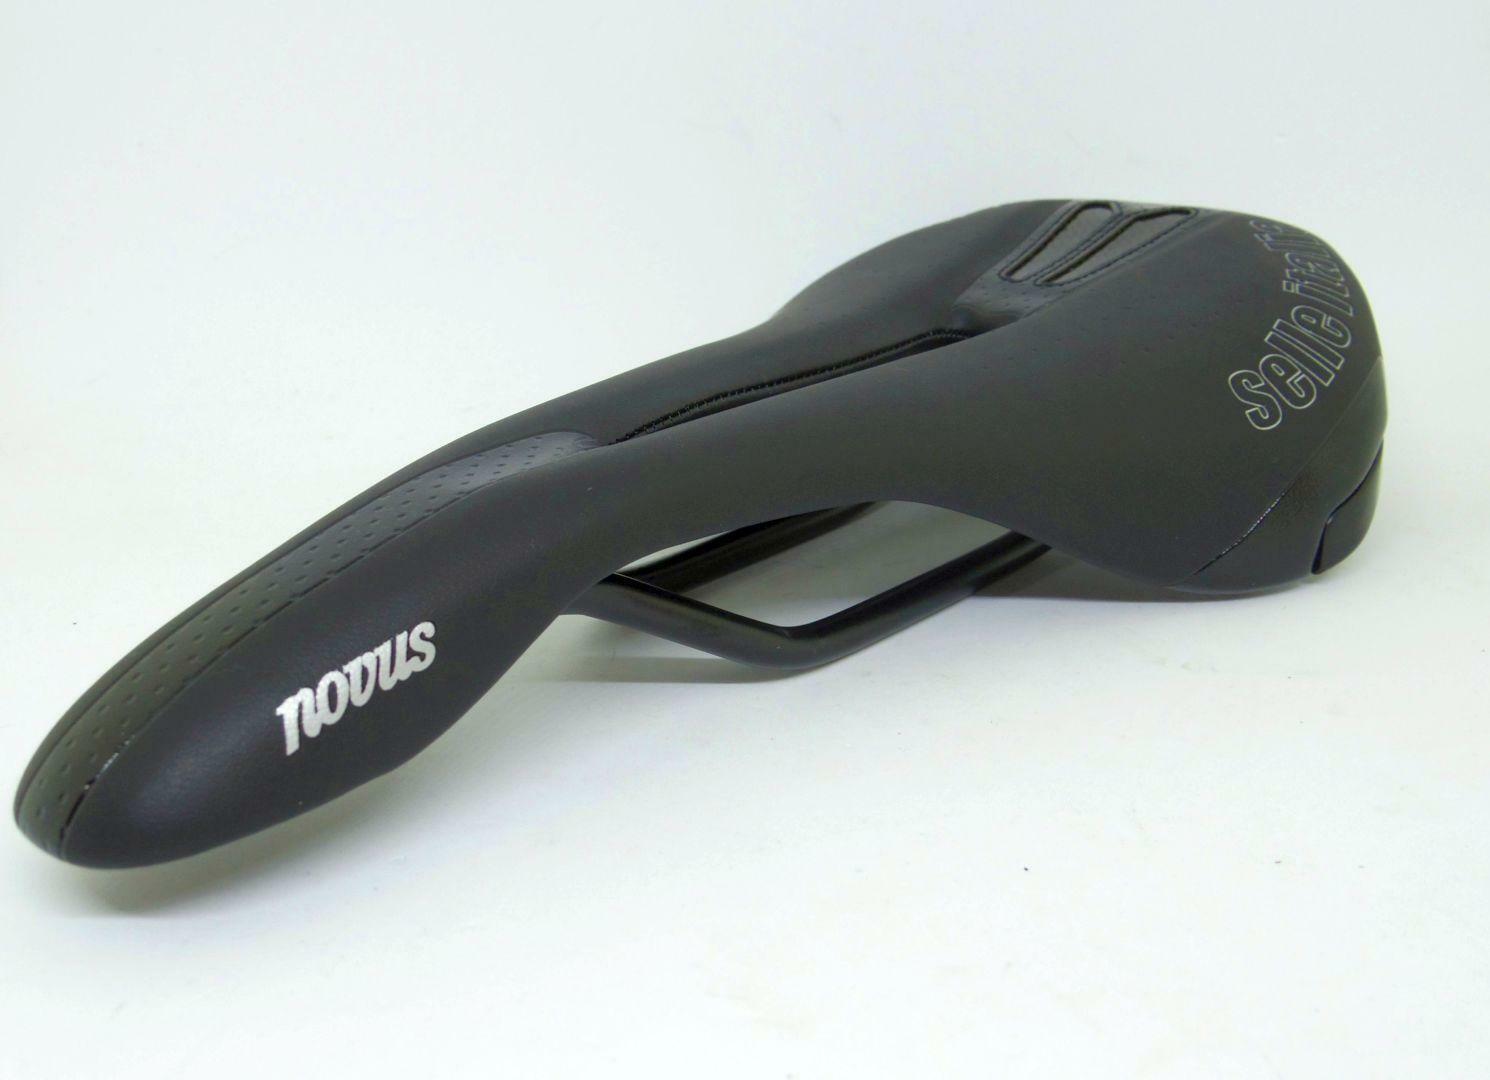 Selle Italia Novus Flow Saddle 252X146mm negro Carril de manganeso